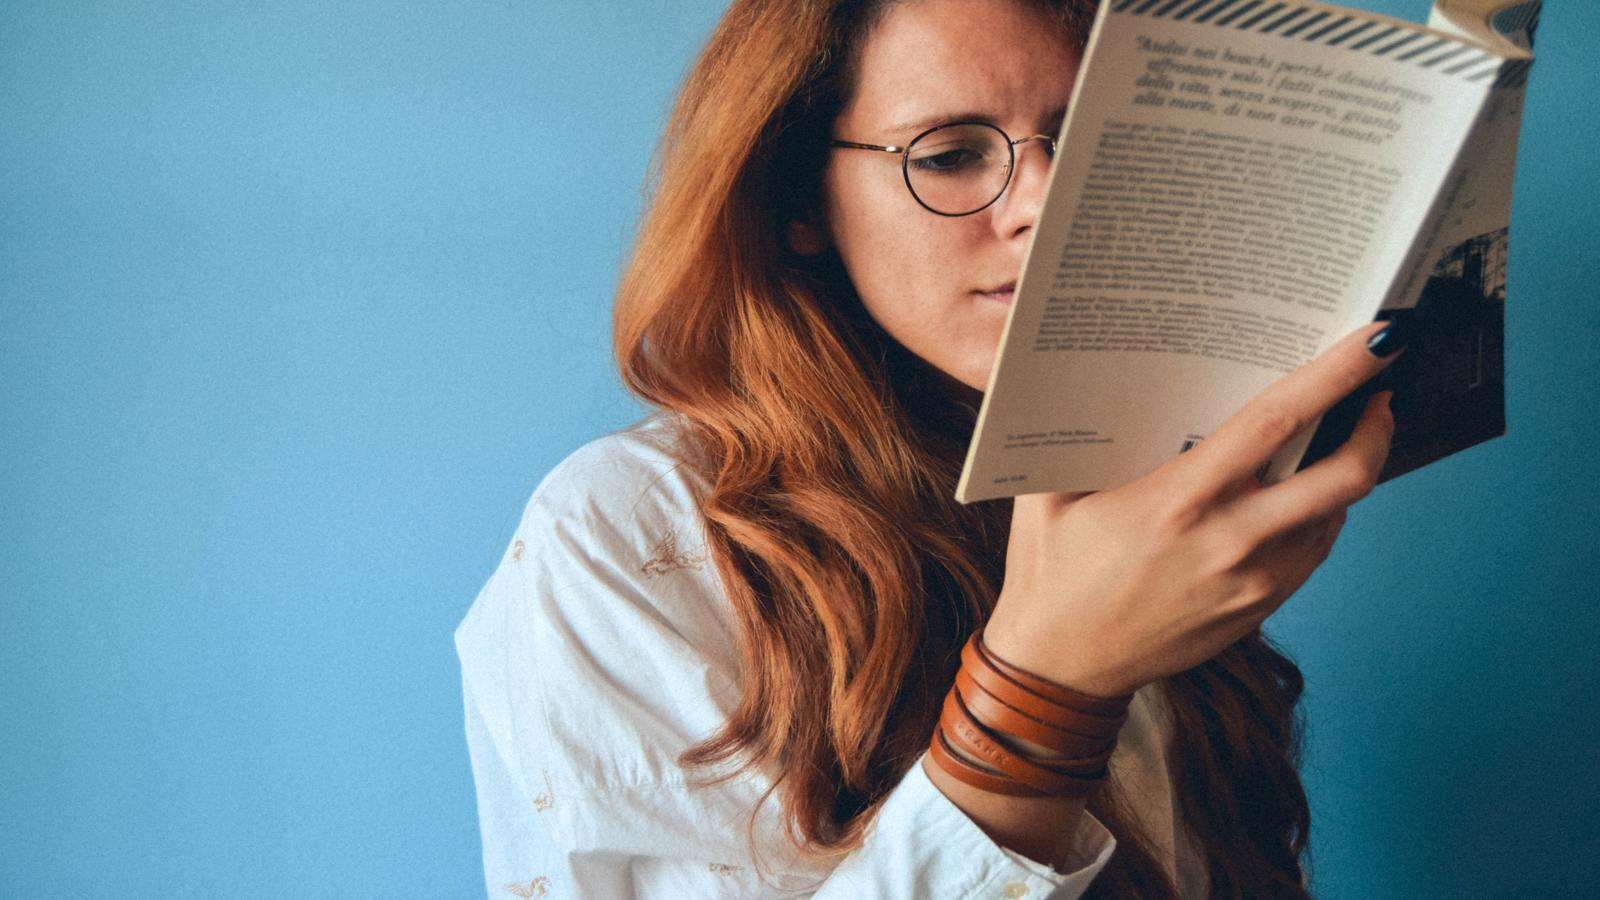 9 Creative Ways to Study Vocabulary Words